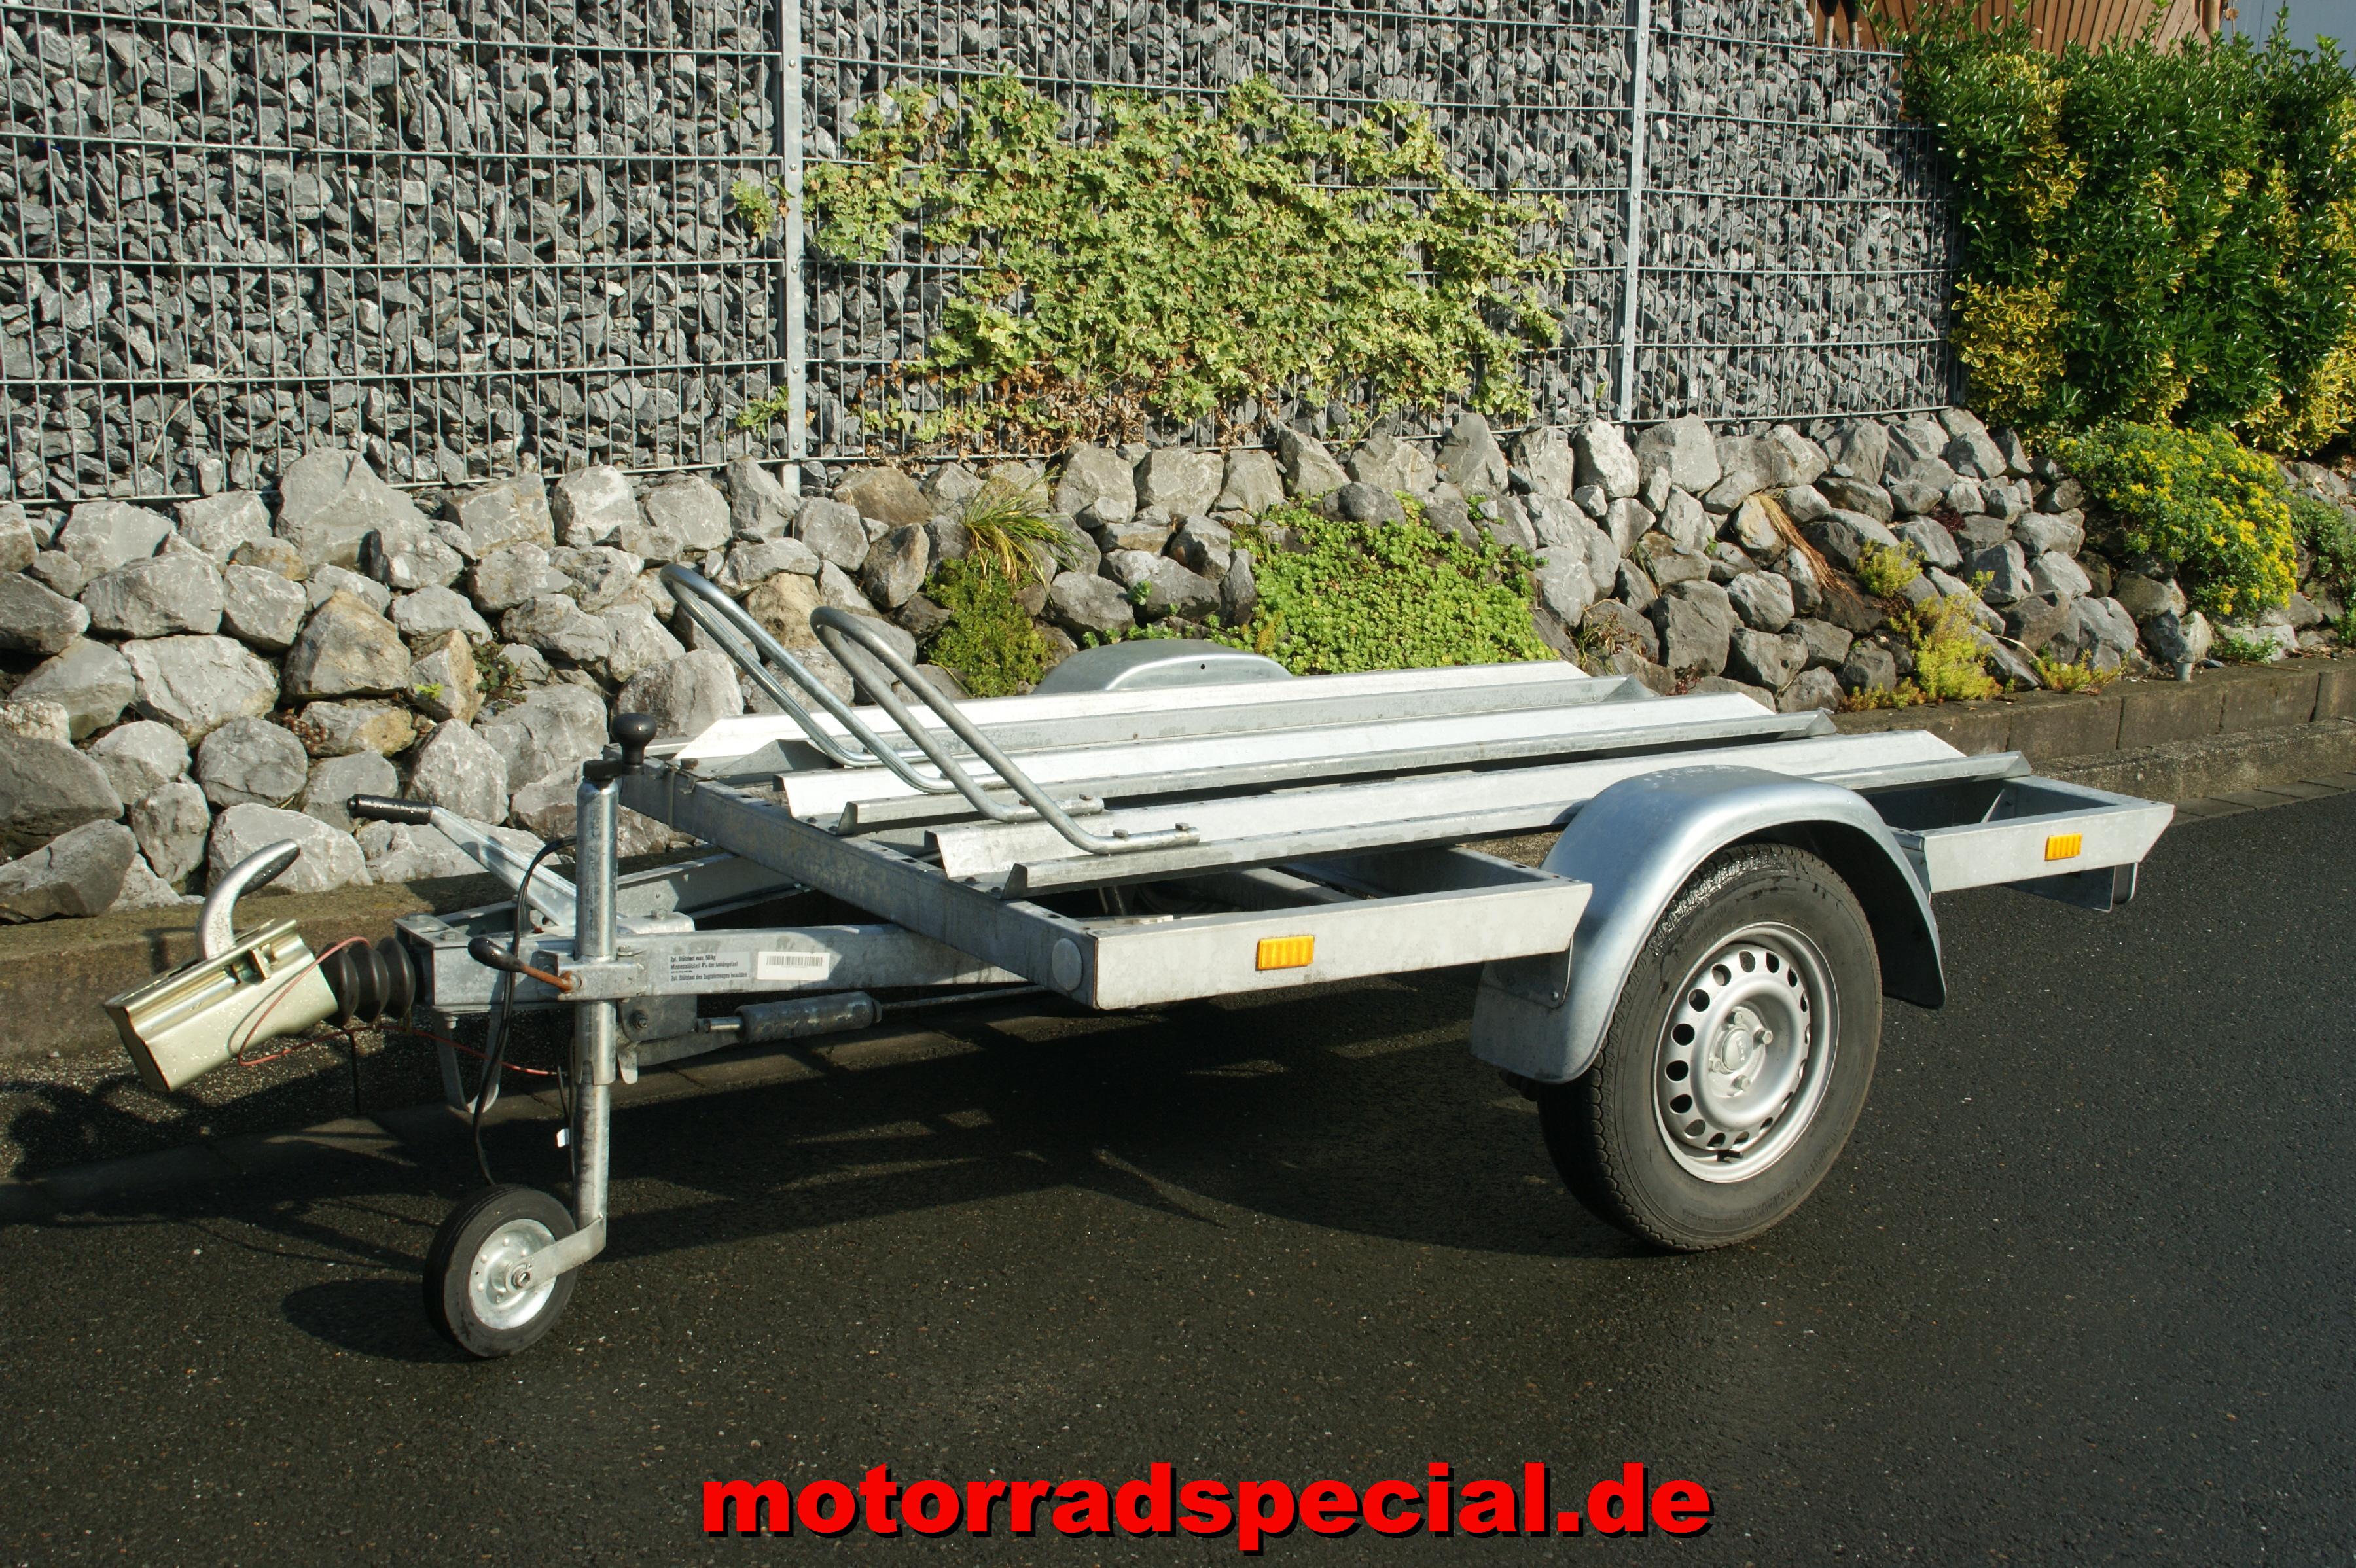 Motorrad Special-Leihänger_klein_1